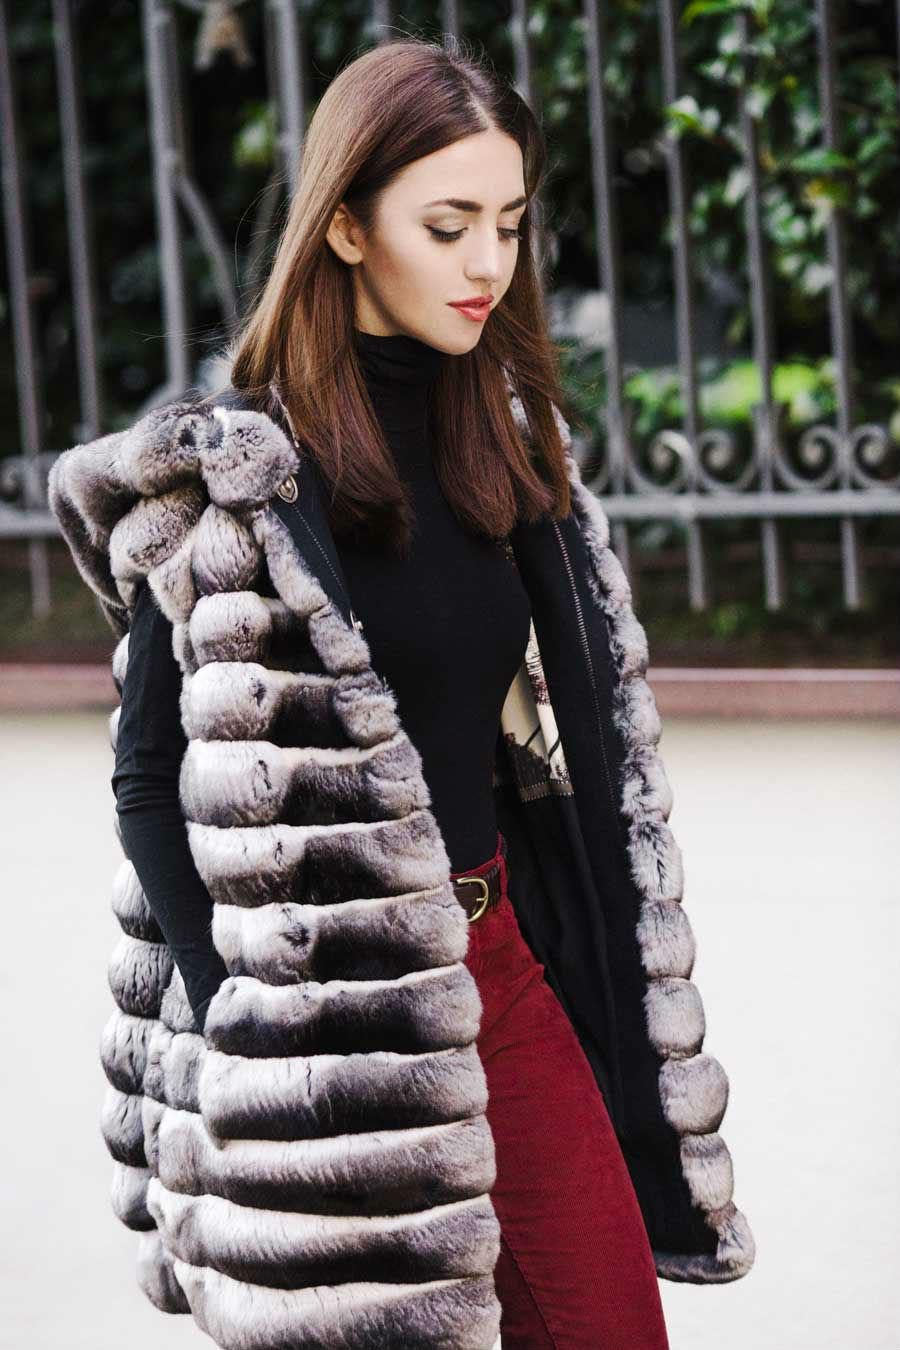 fur vest with hood